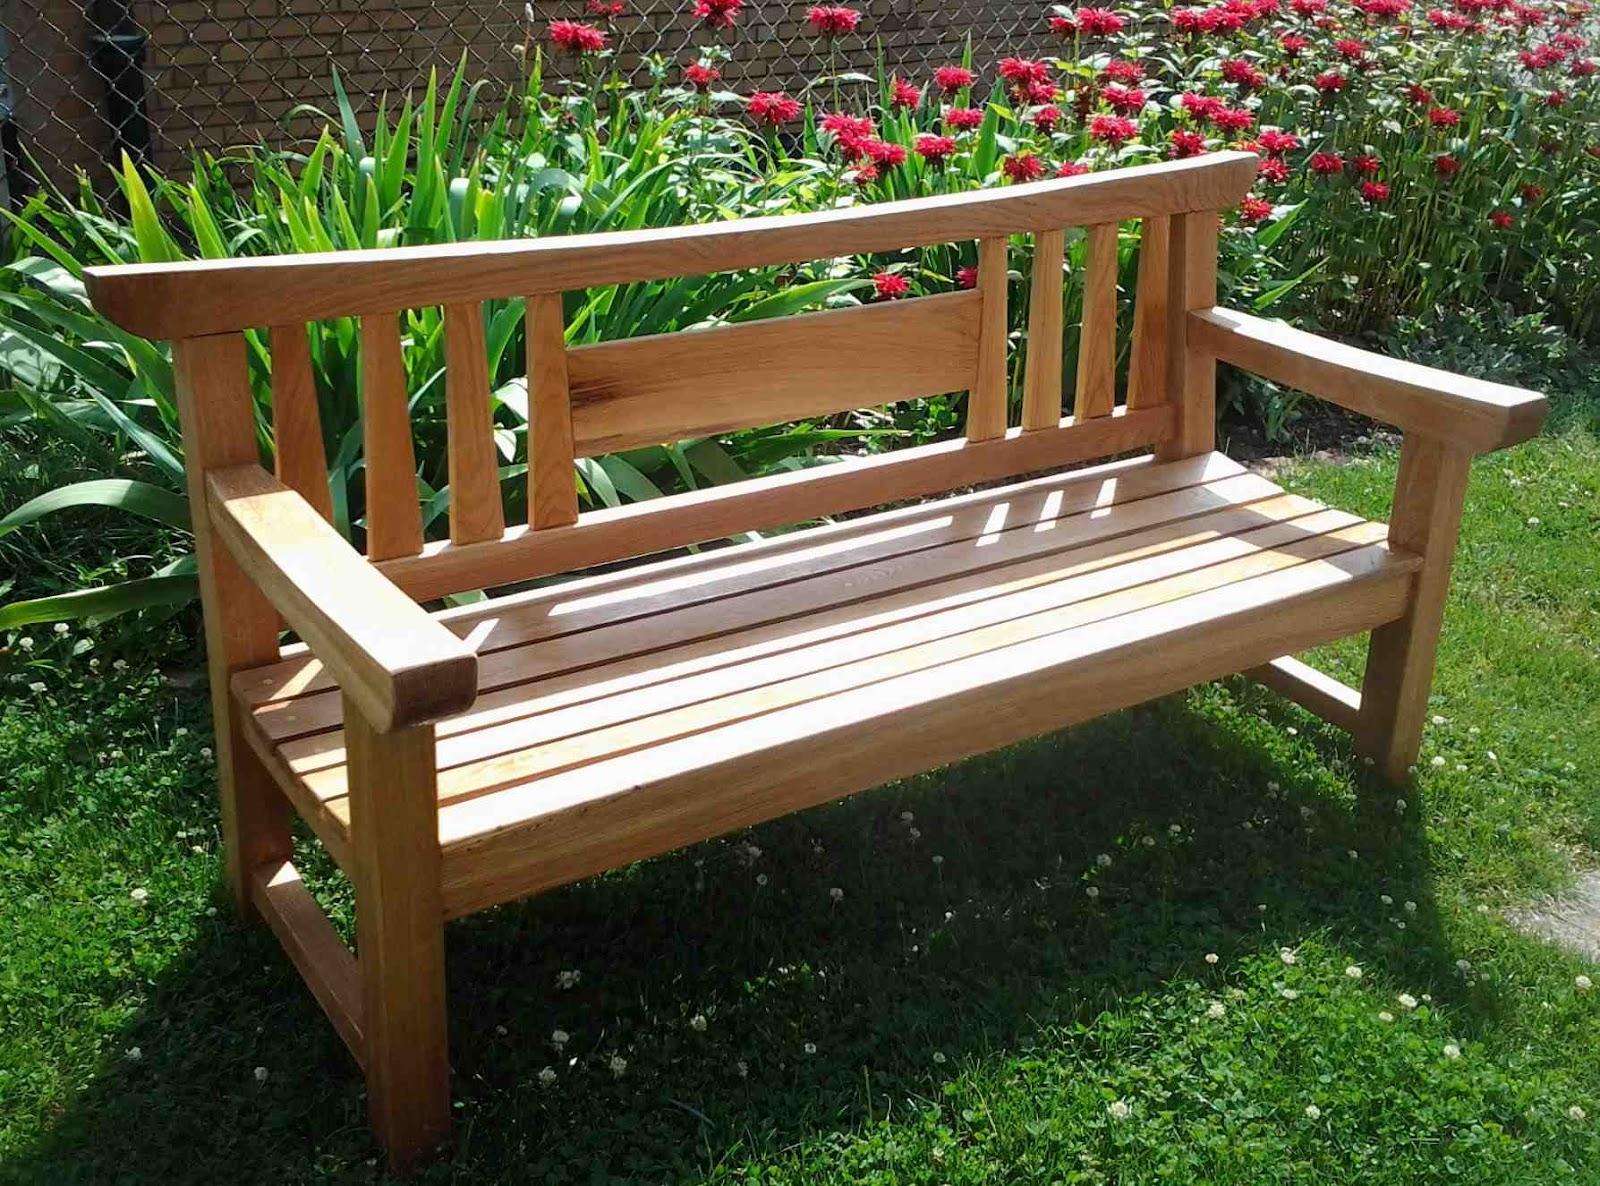 First Light Woodworking - Unplugged: Japanese Garden Bench